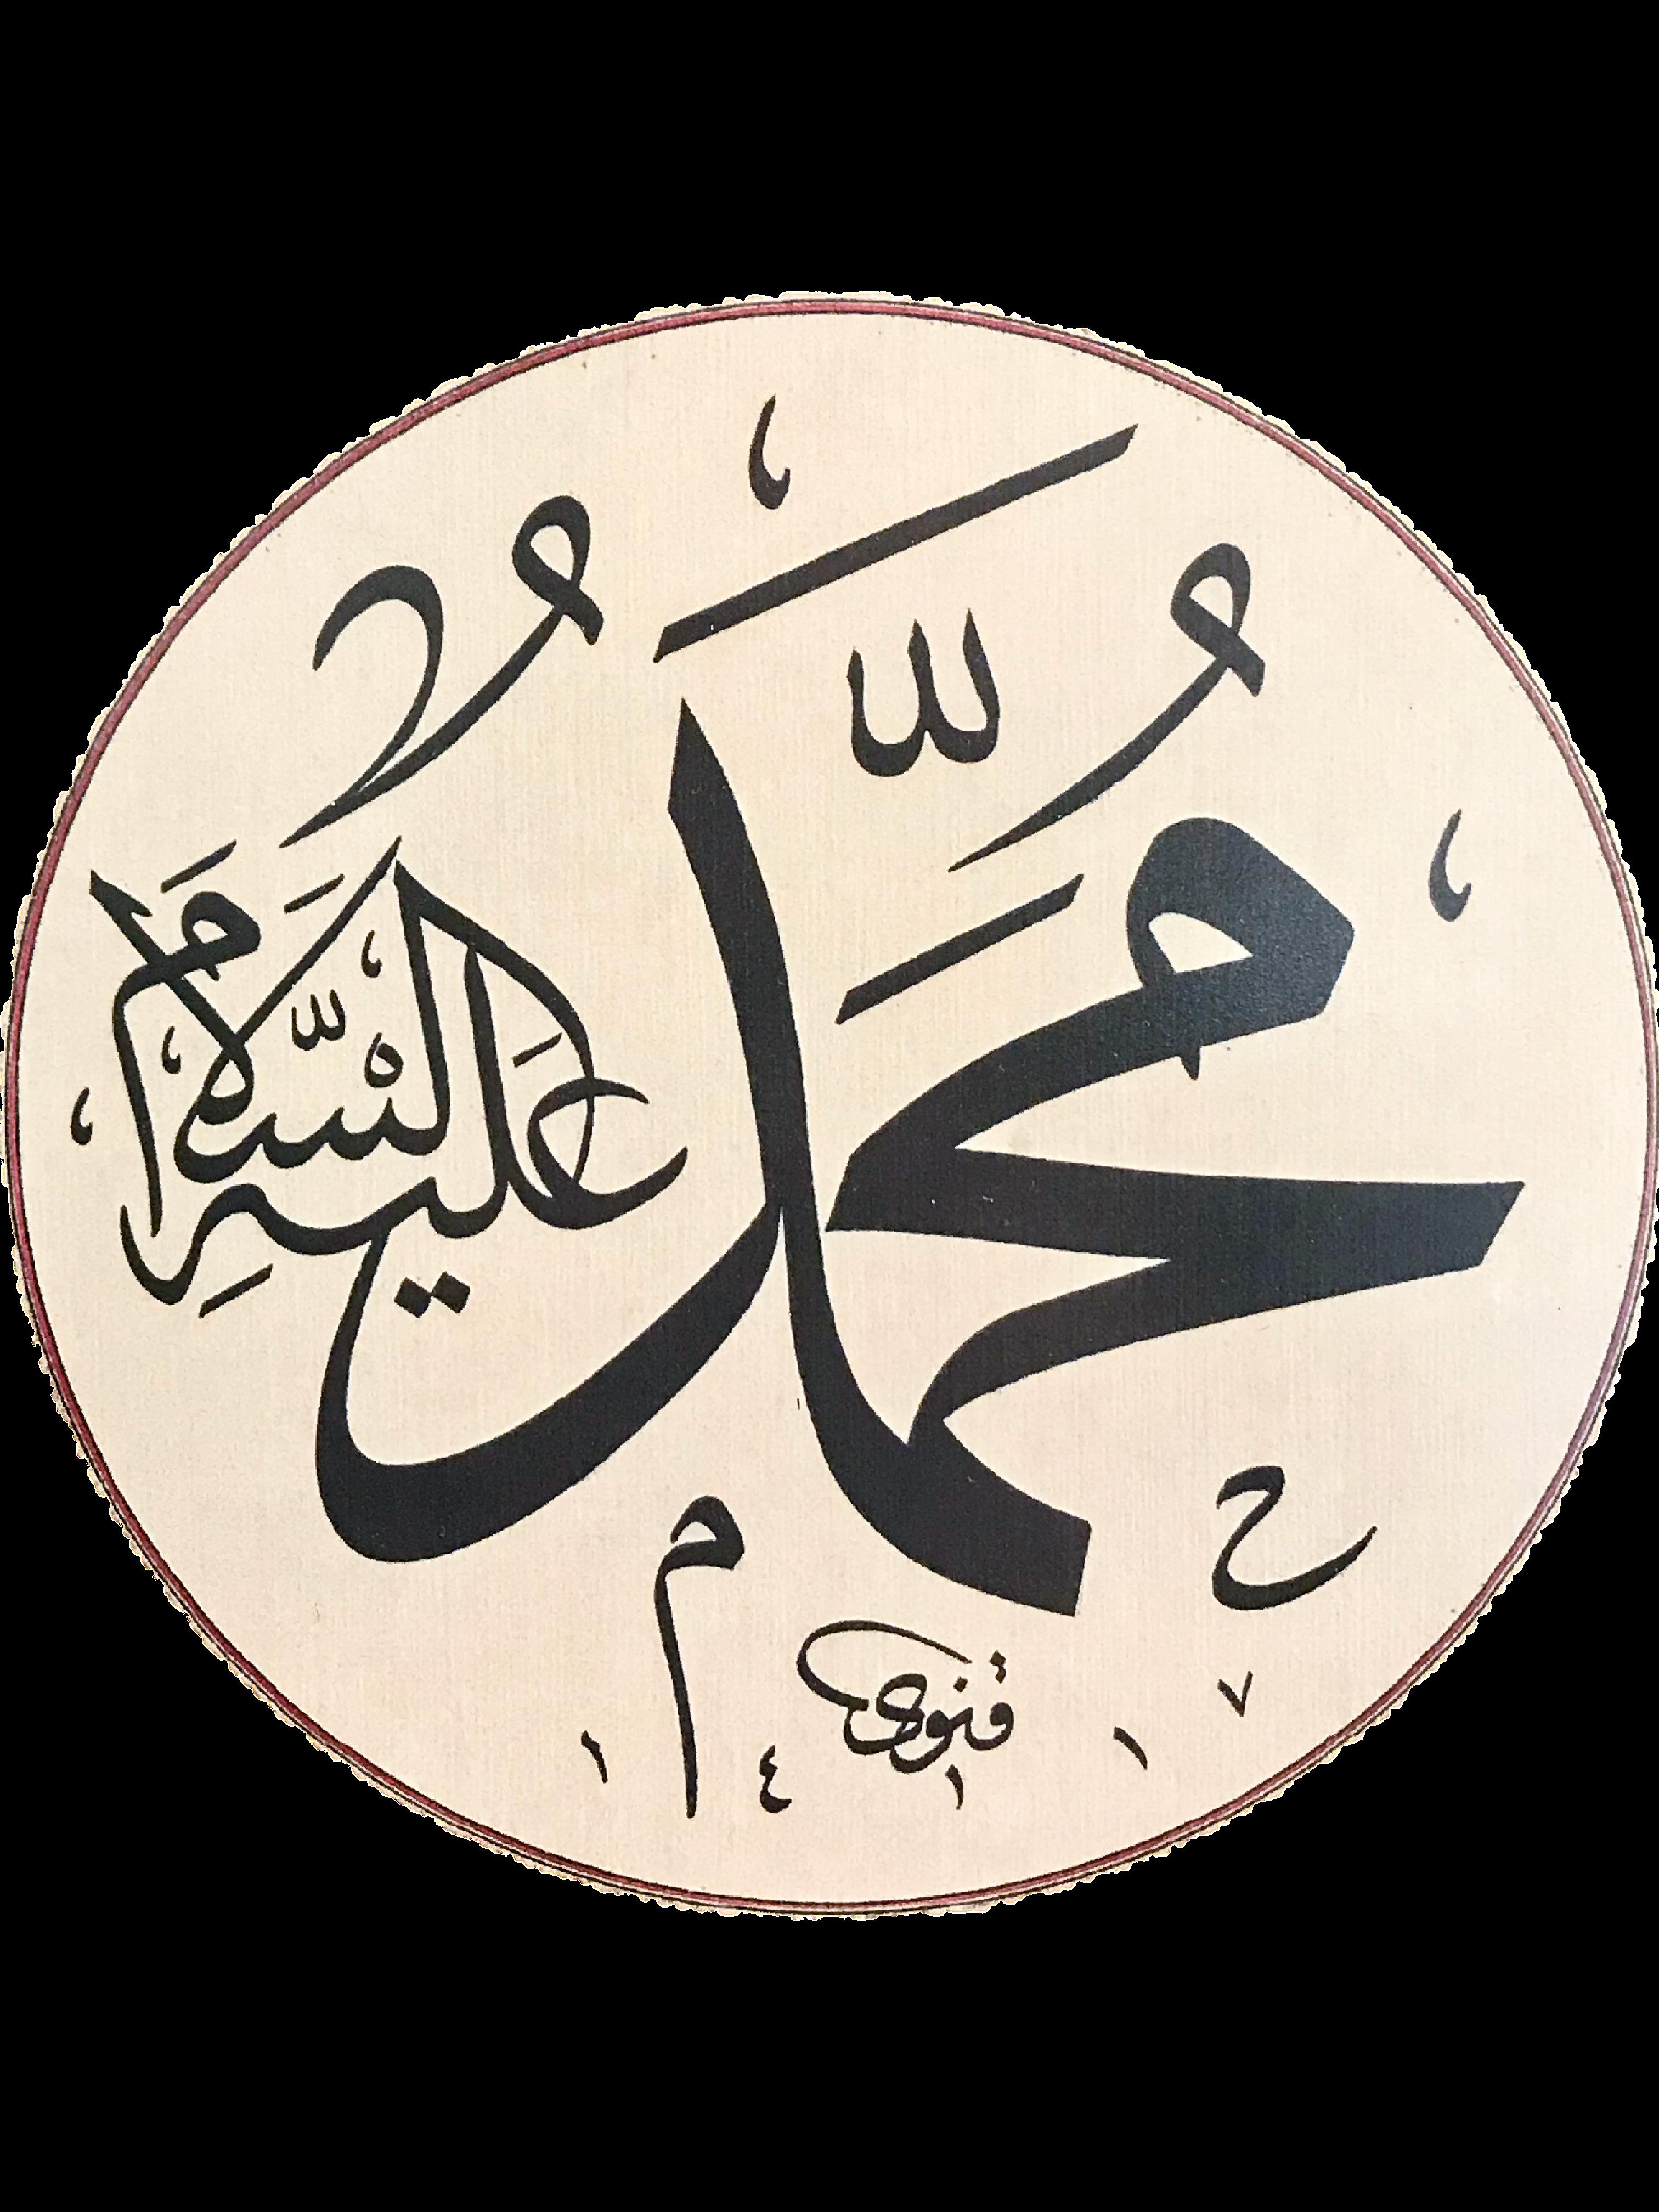 Pin Oleh Hassen Denmamode Di Hat Allah Cc Seni Kaligrafi Seni Kaligrafi